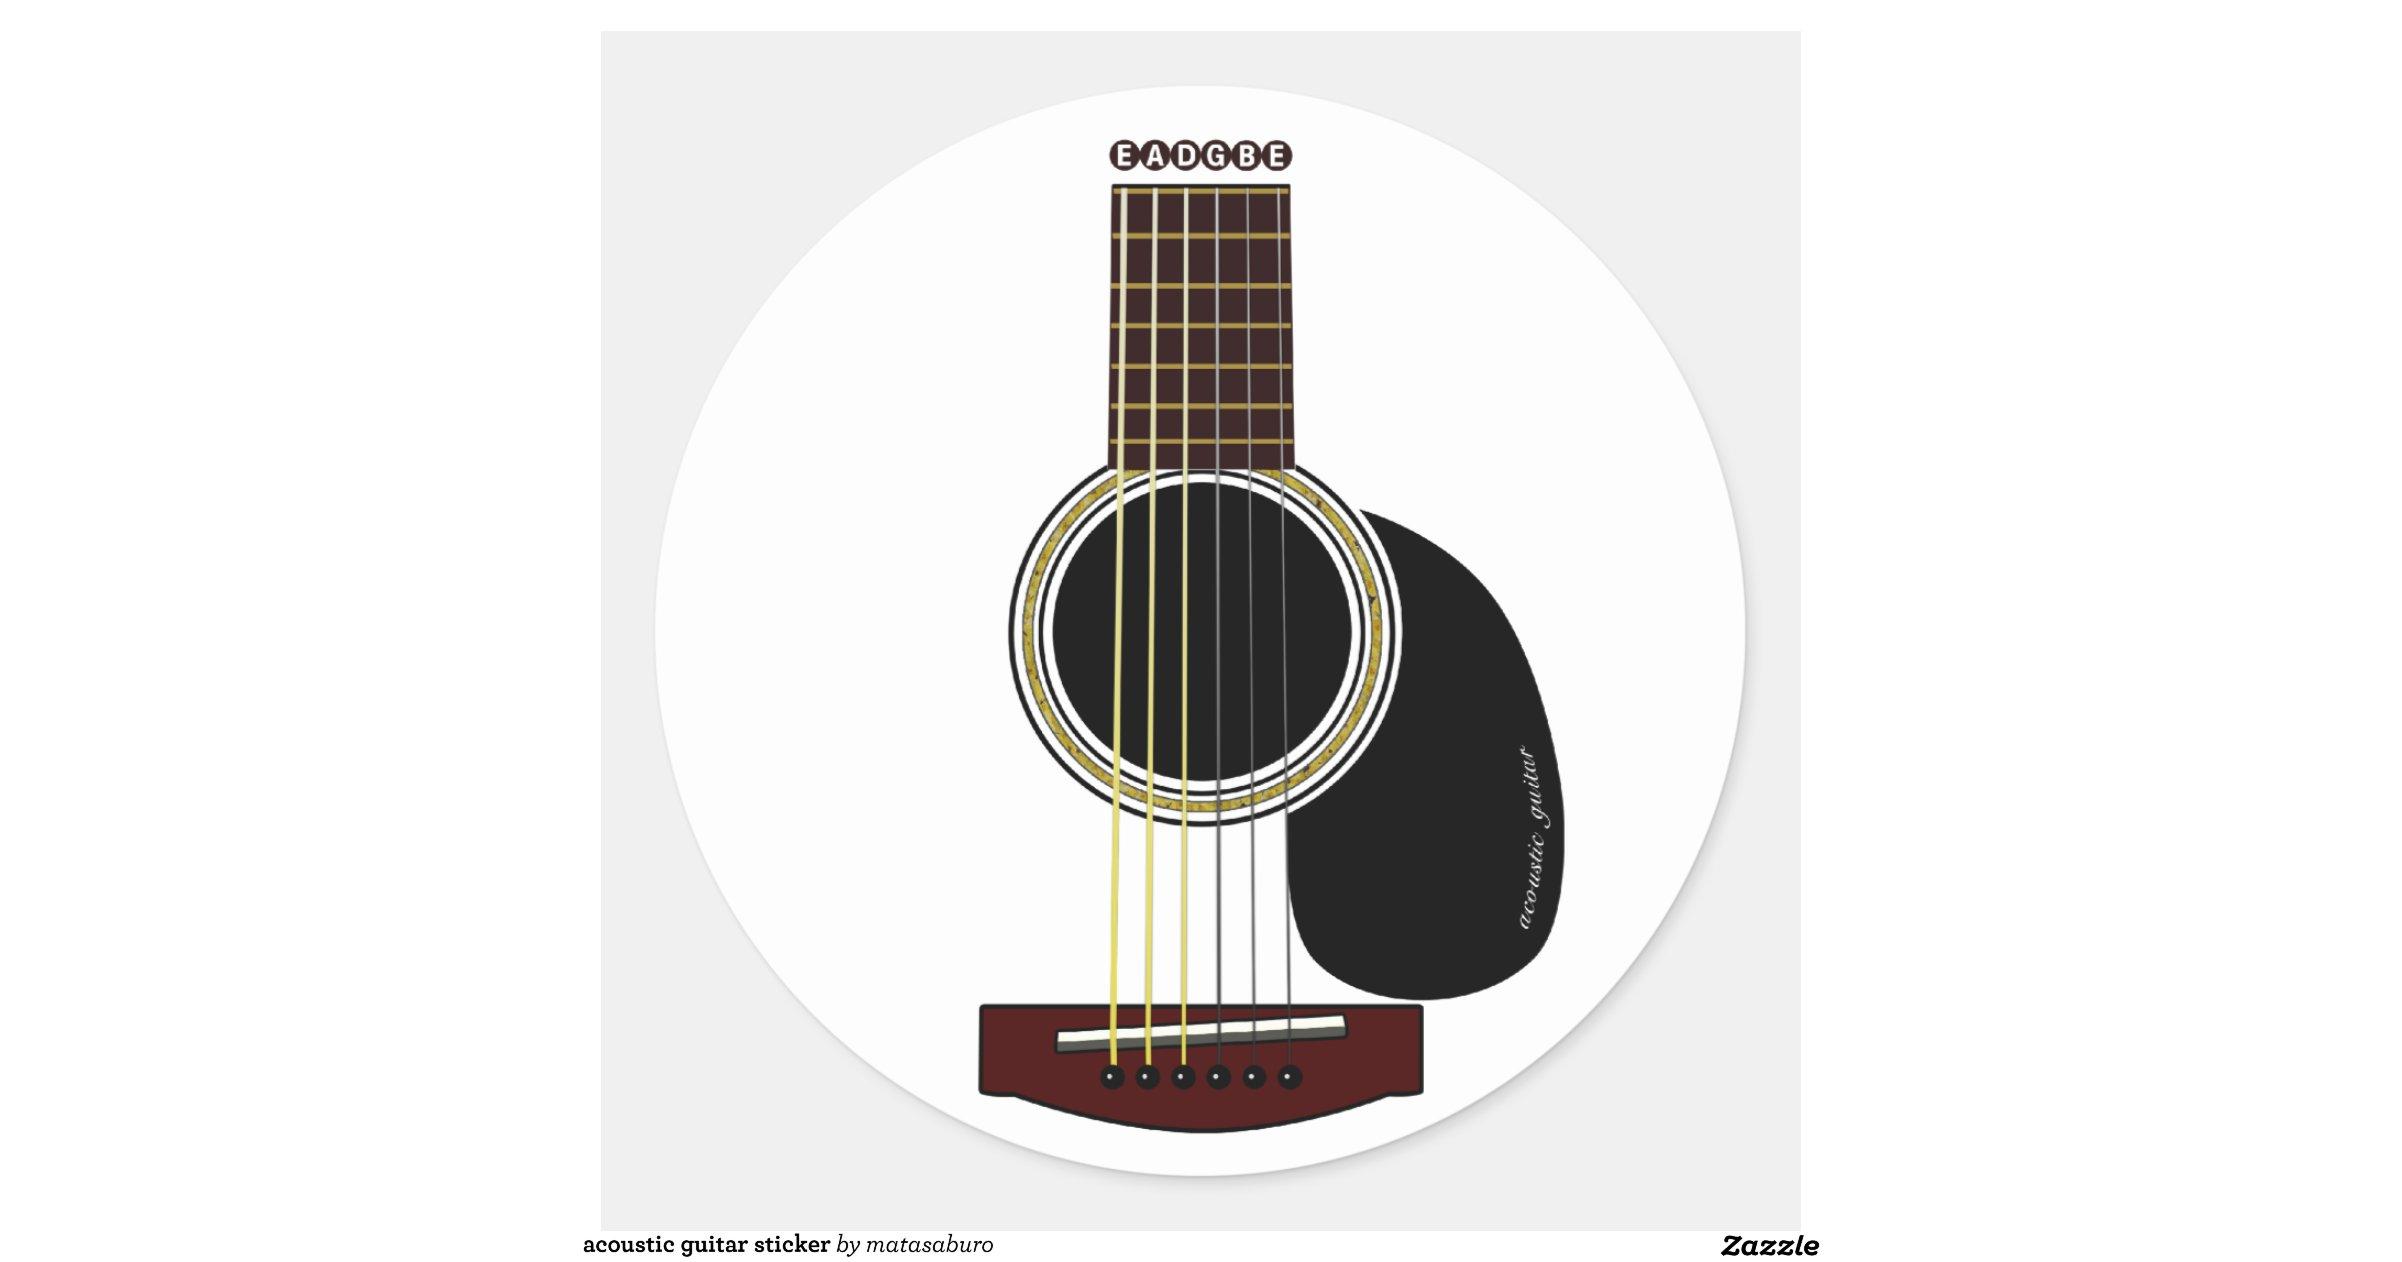 acoustic guitar sticker r1acdb9590acf4858ab03402ad7870f57 v9waf 8byvr. Black Bedroom Furniture Sets. Home Design Ideas